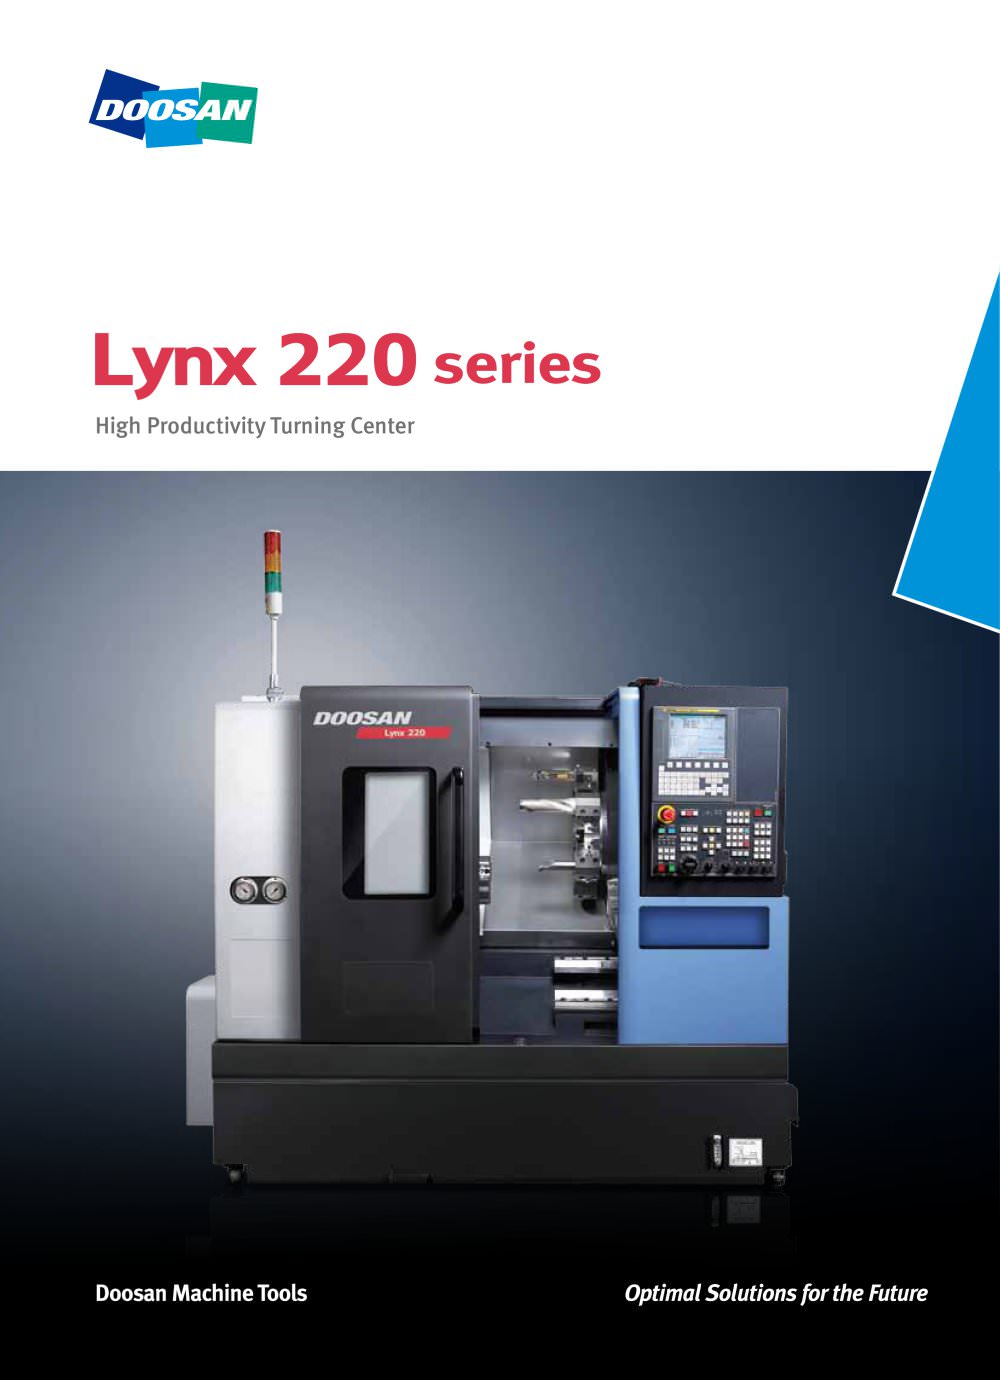 lynx 220 series doosan machine tools pdf catalogue technical rh pdf directindustry com Doosan Lynx 220Lmsa Doosan Lynx 220Lc